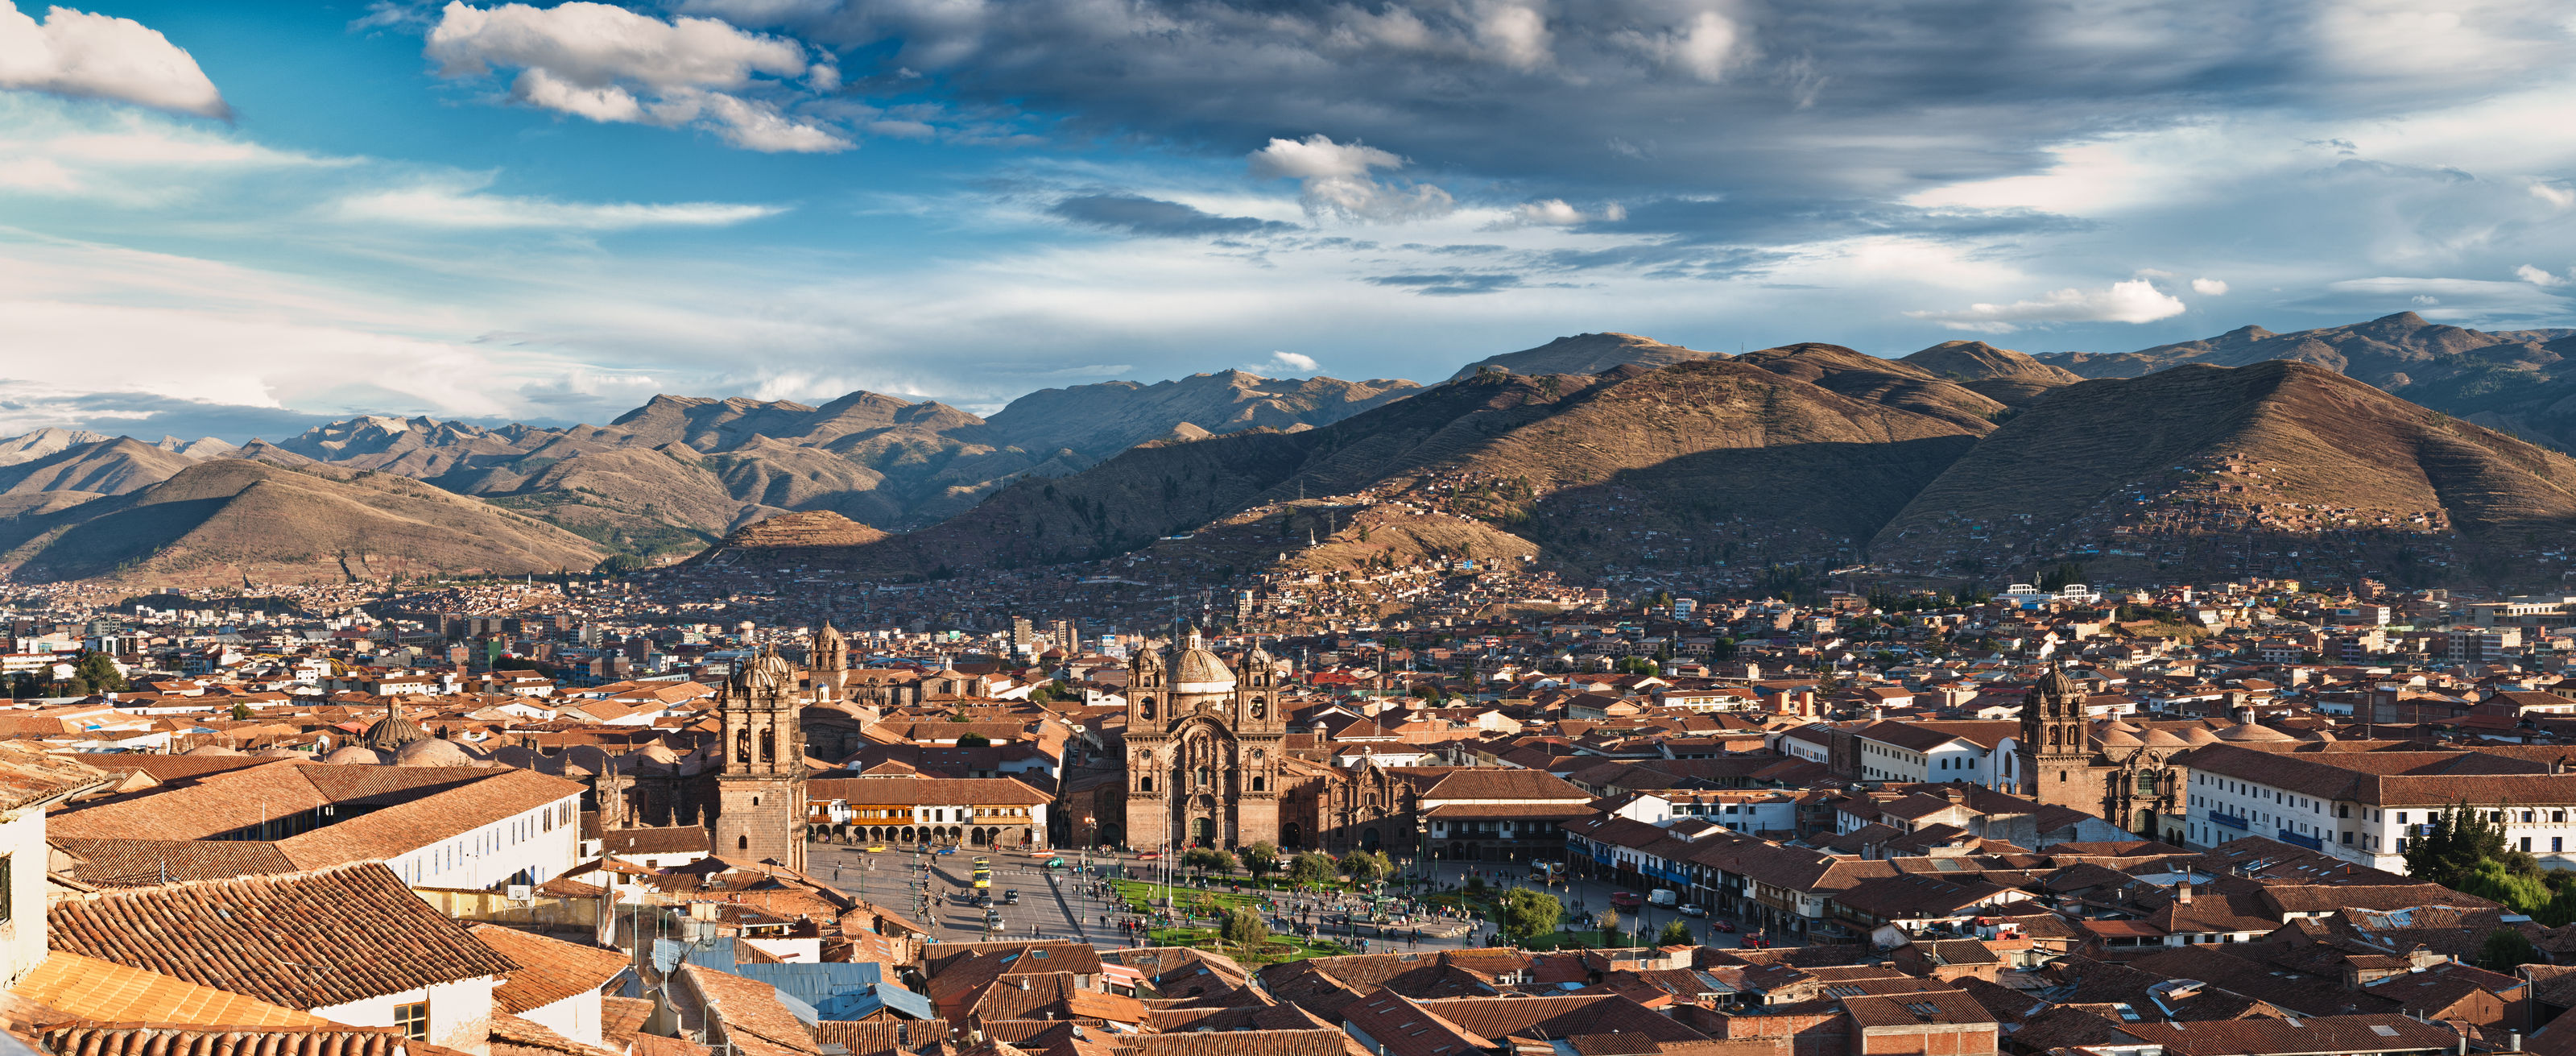 cuzco-view